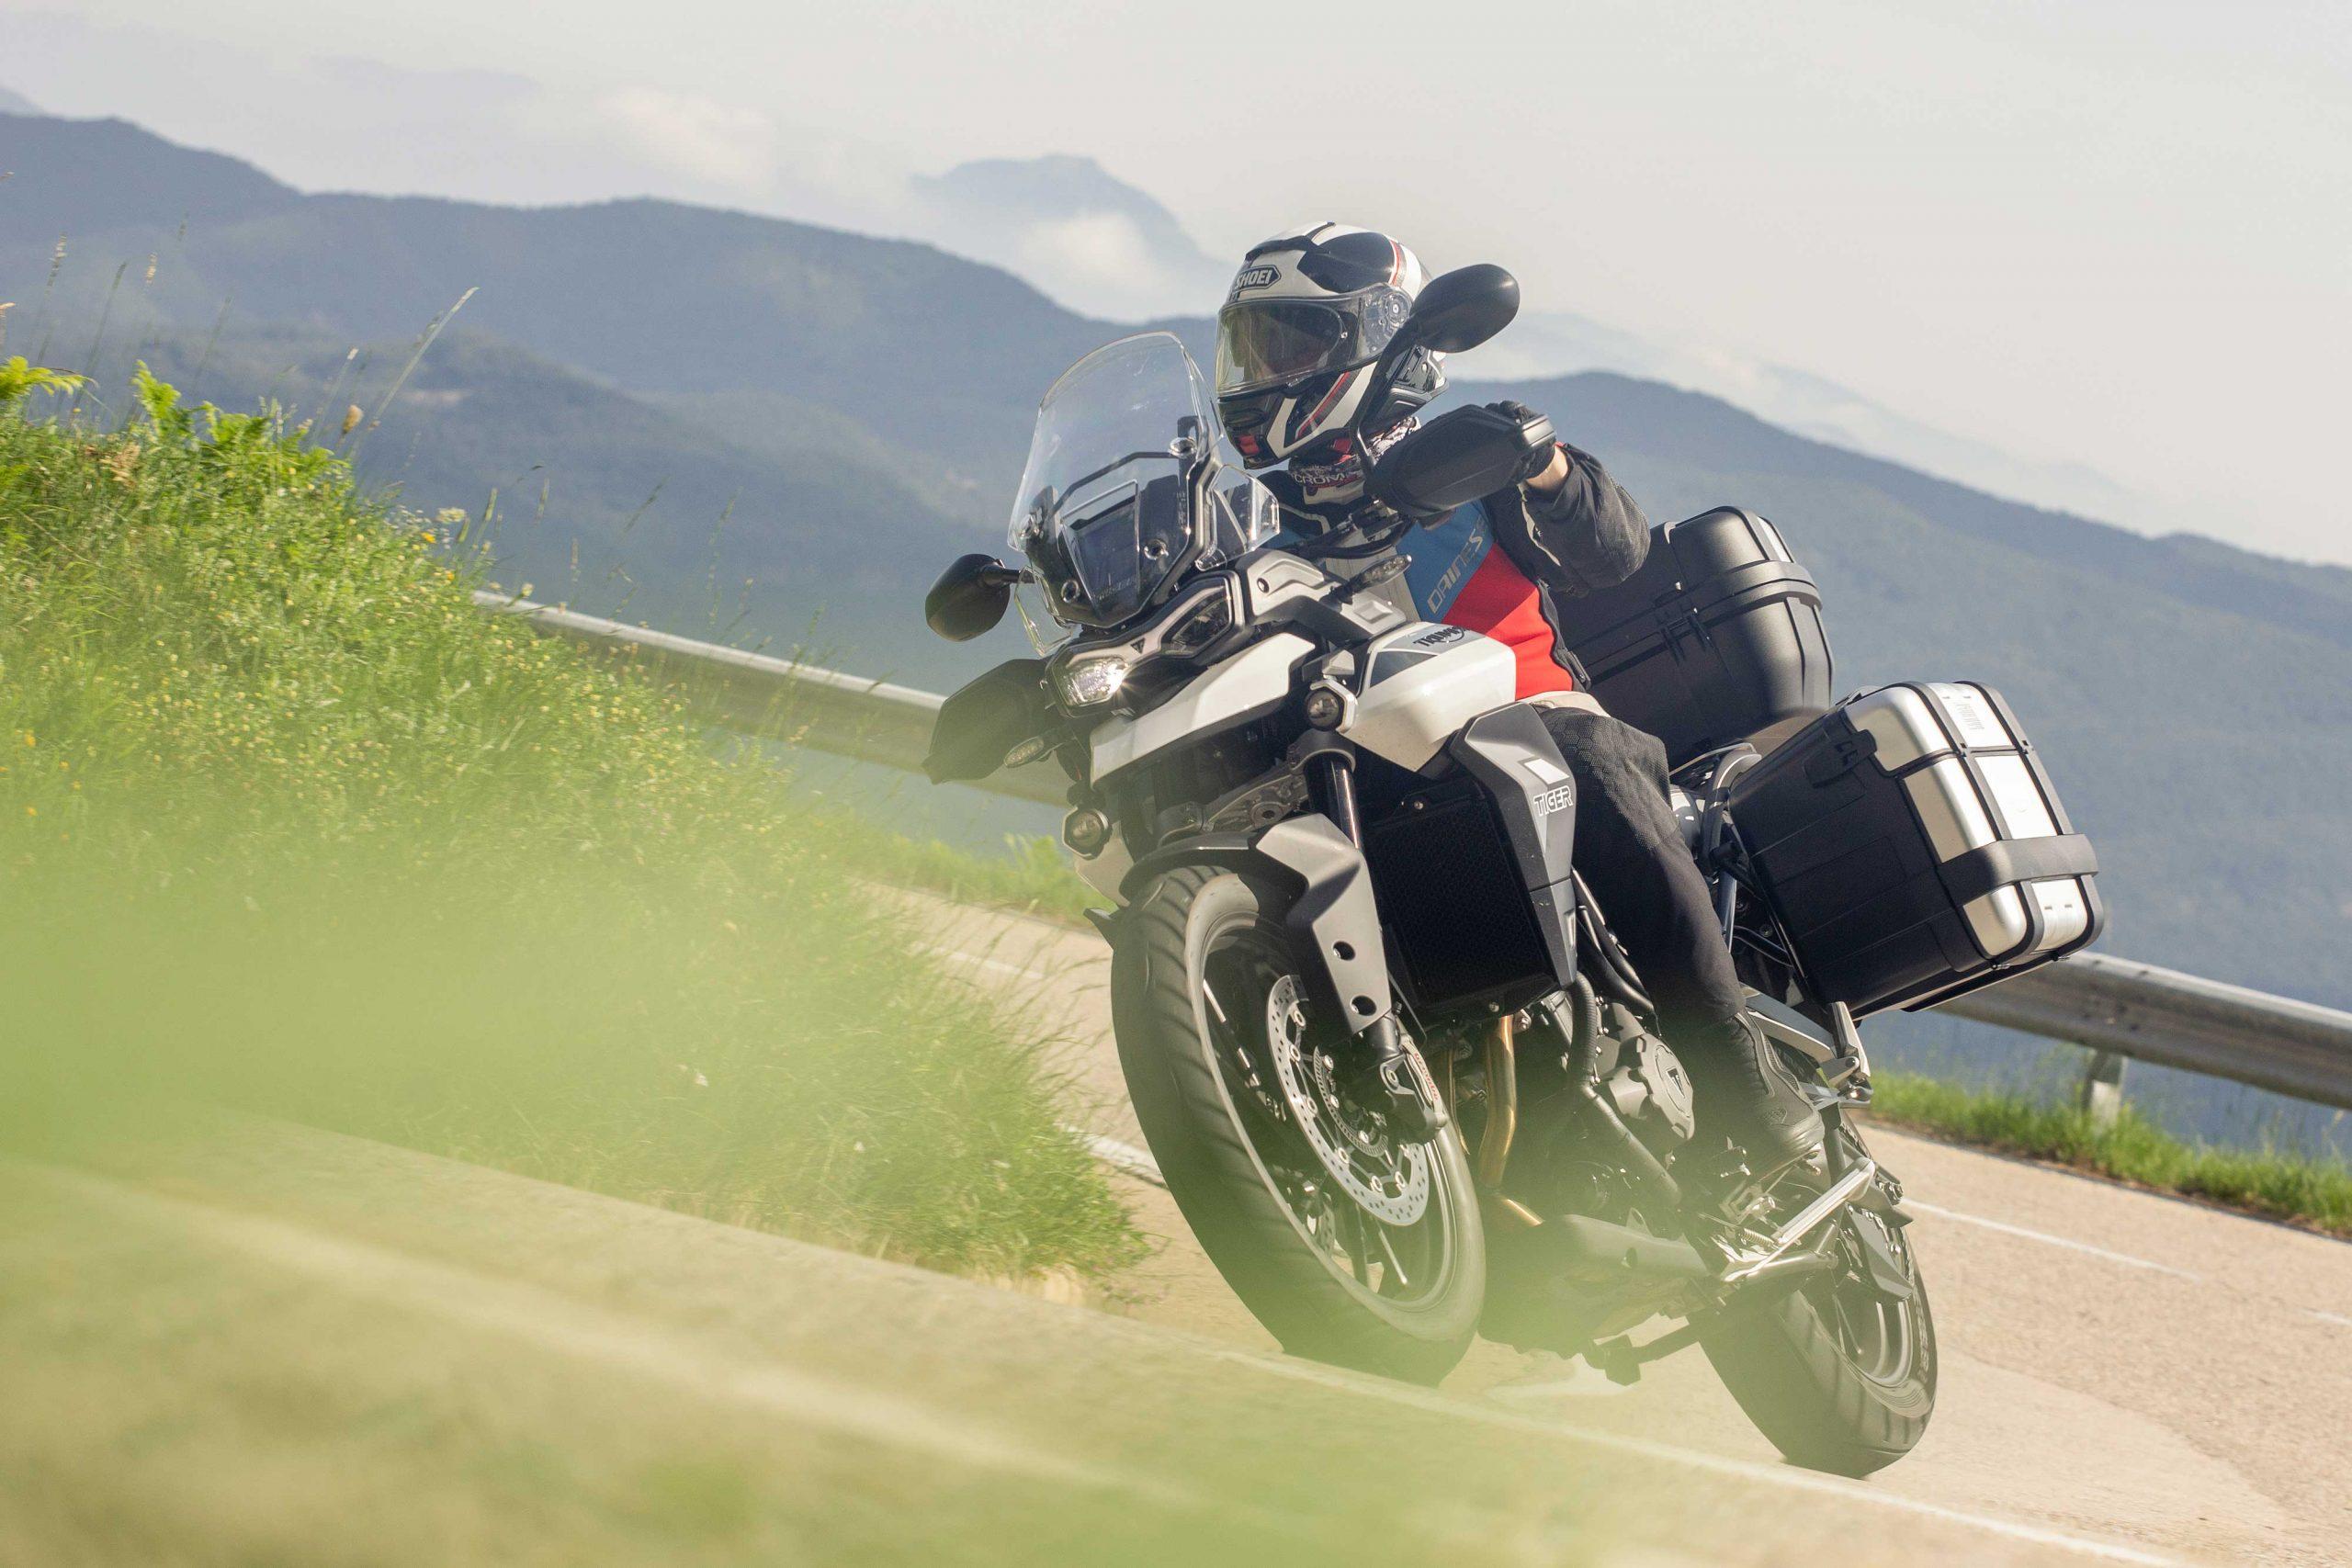 008_TriumphTiger-motosnet-mariapujol-fotografobarcelona